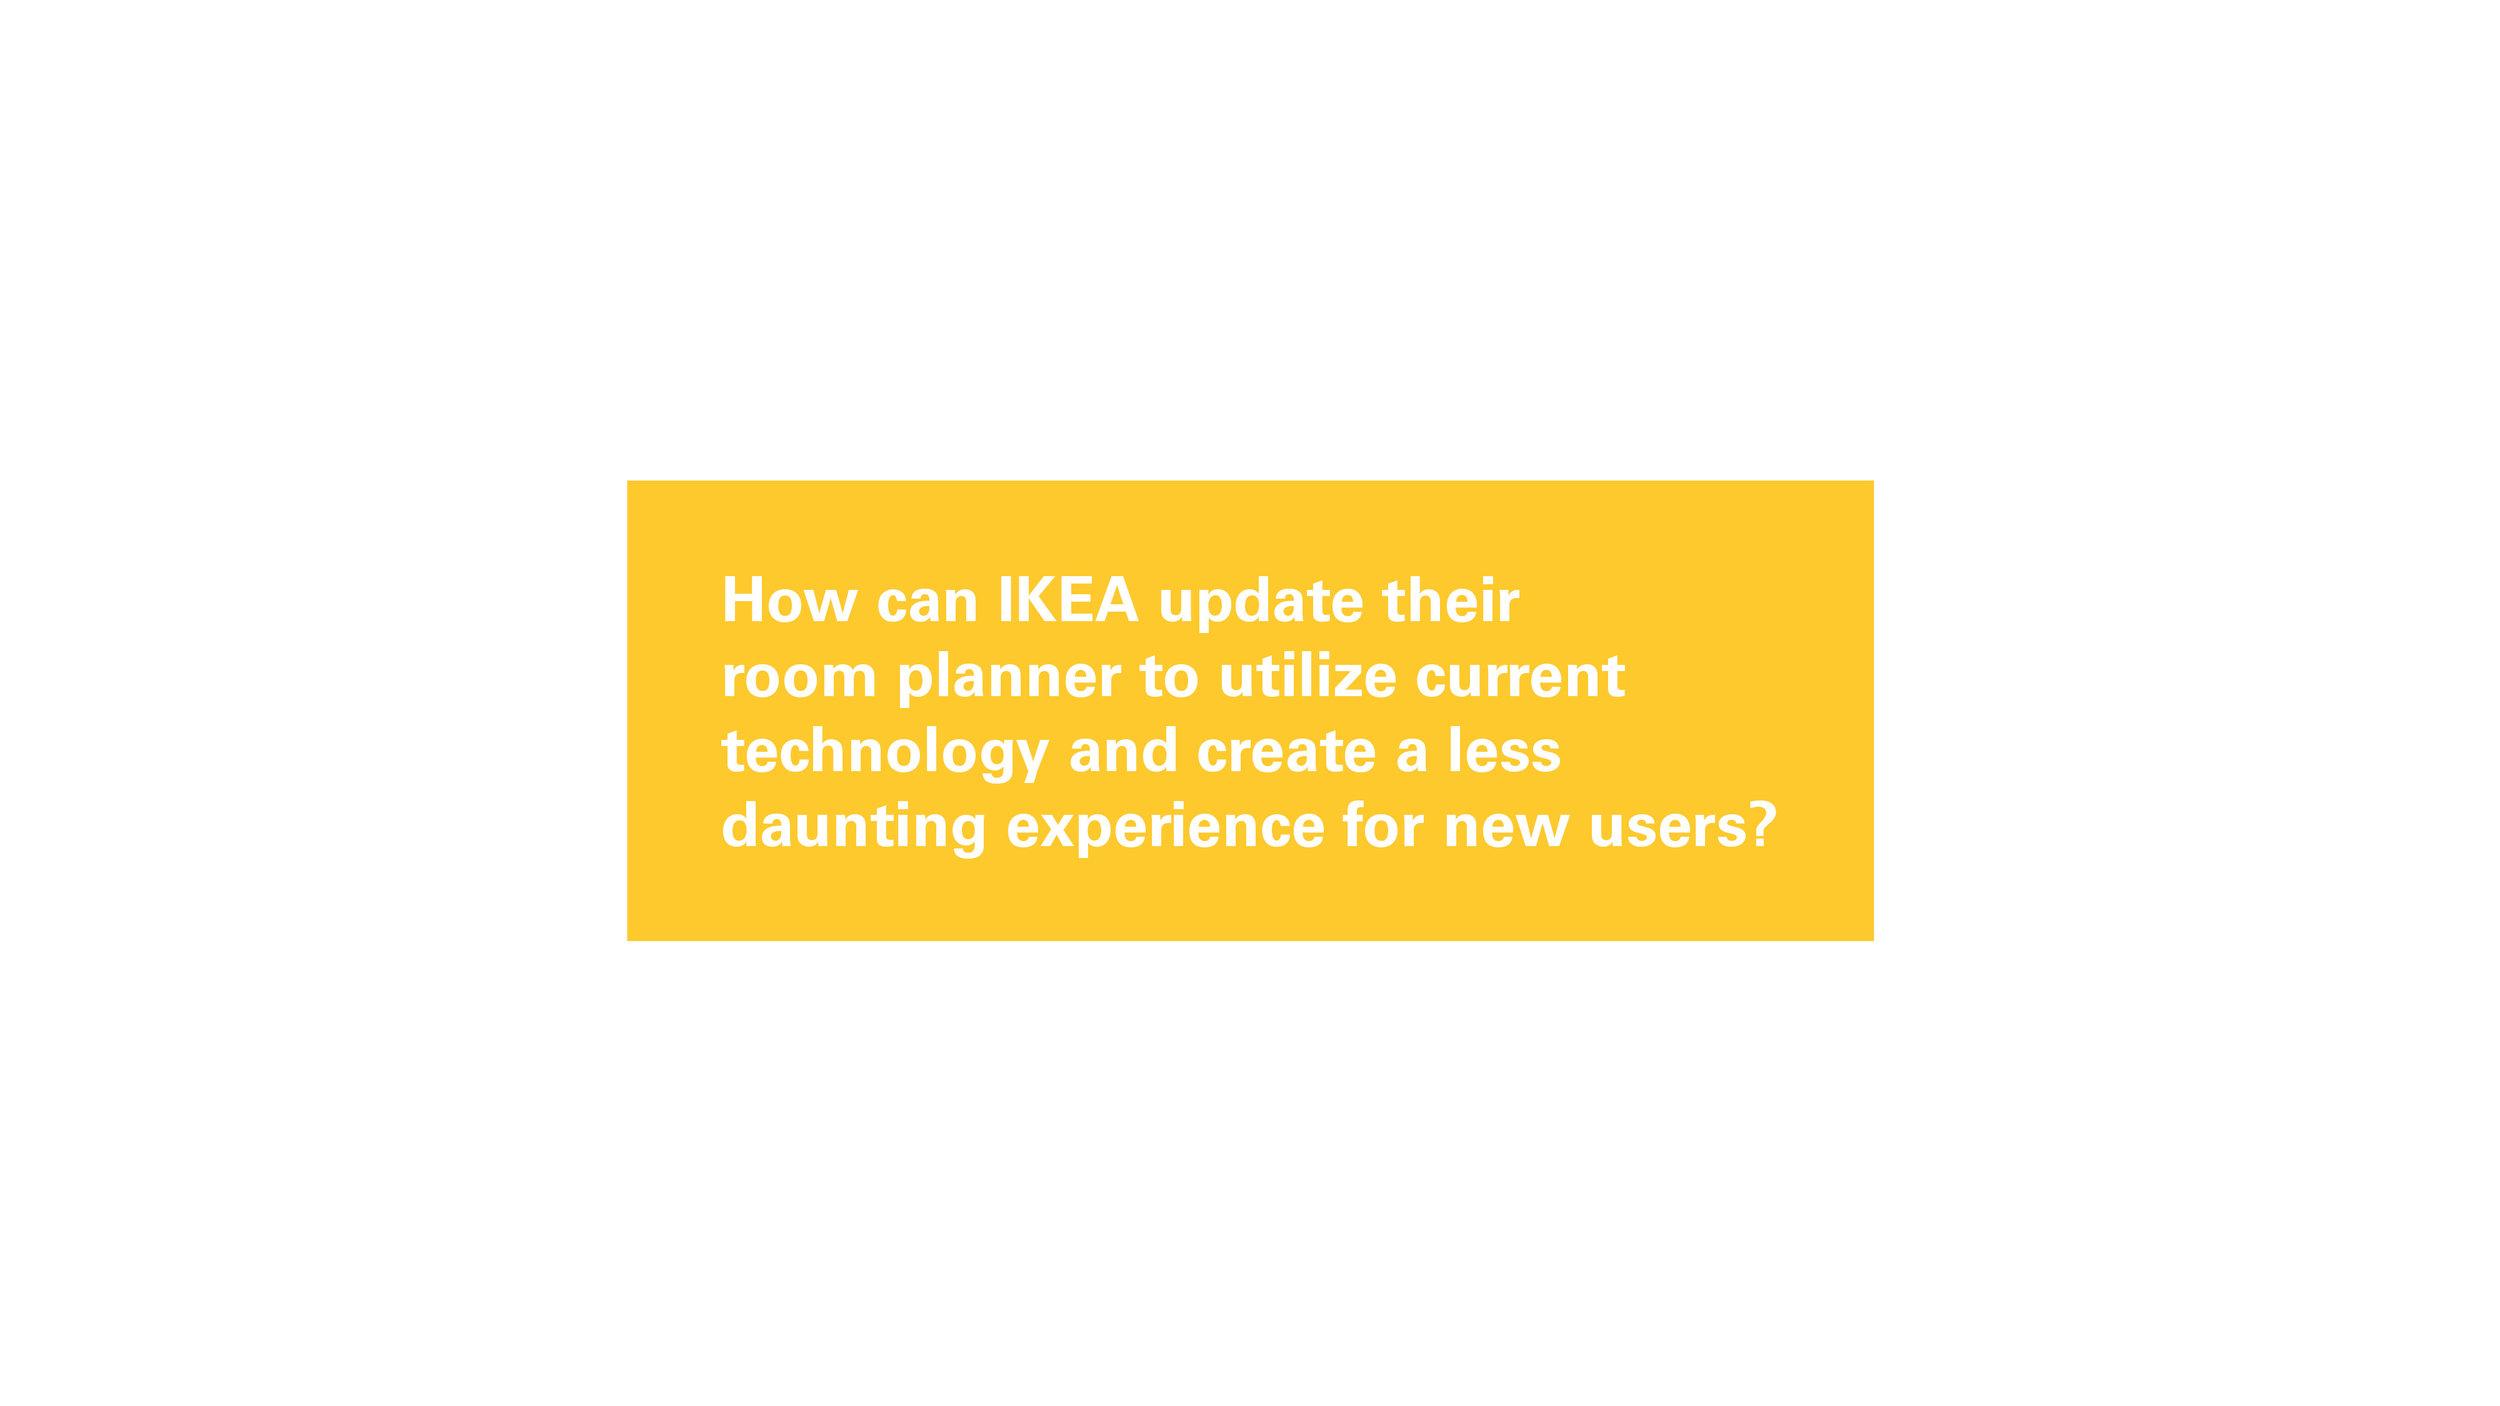 IKEA_AR_Planner_ProcessBook2.jpg